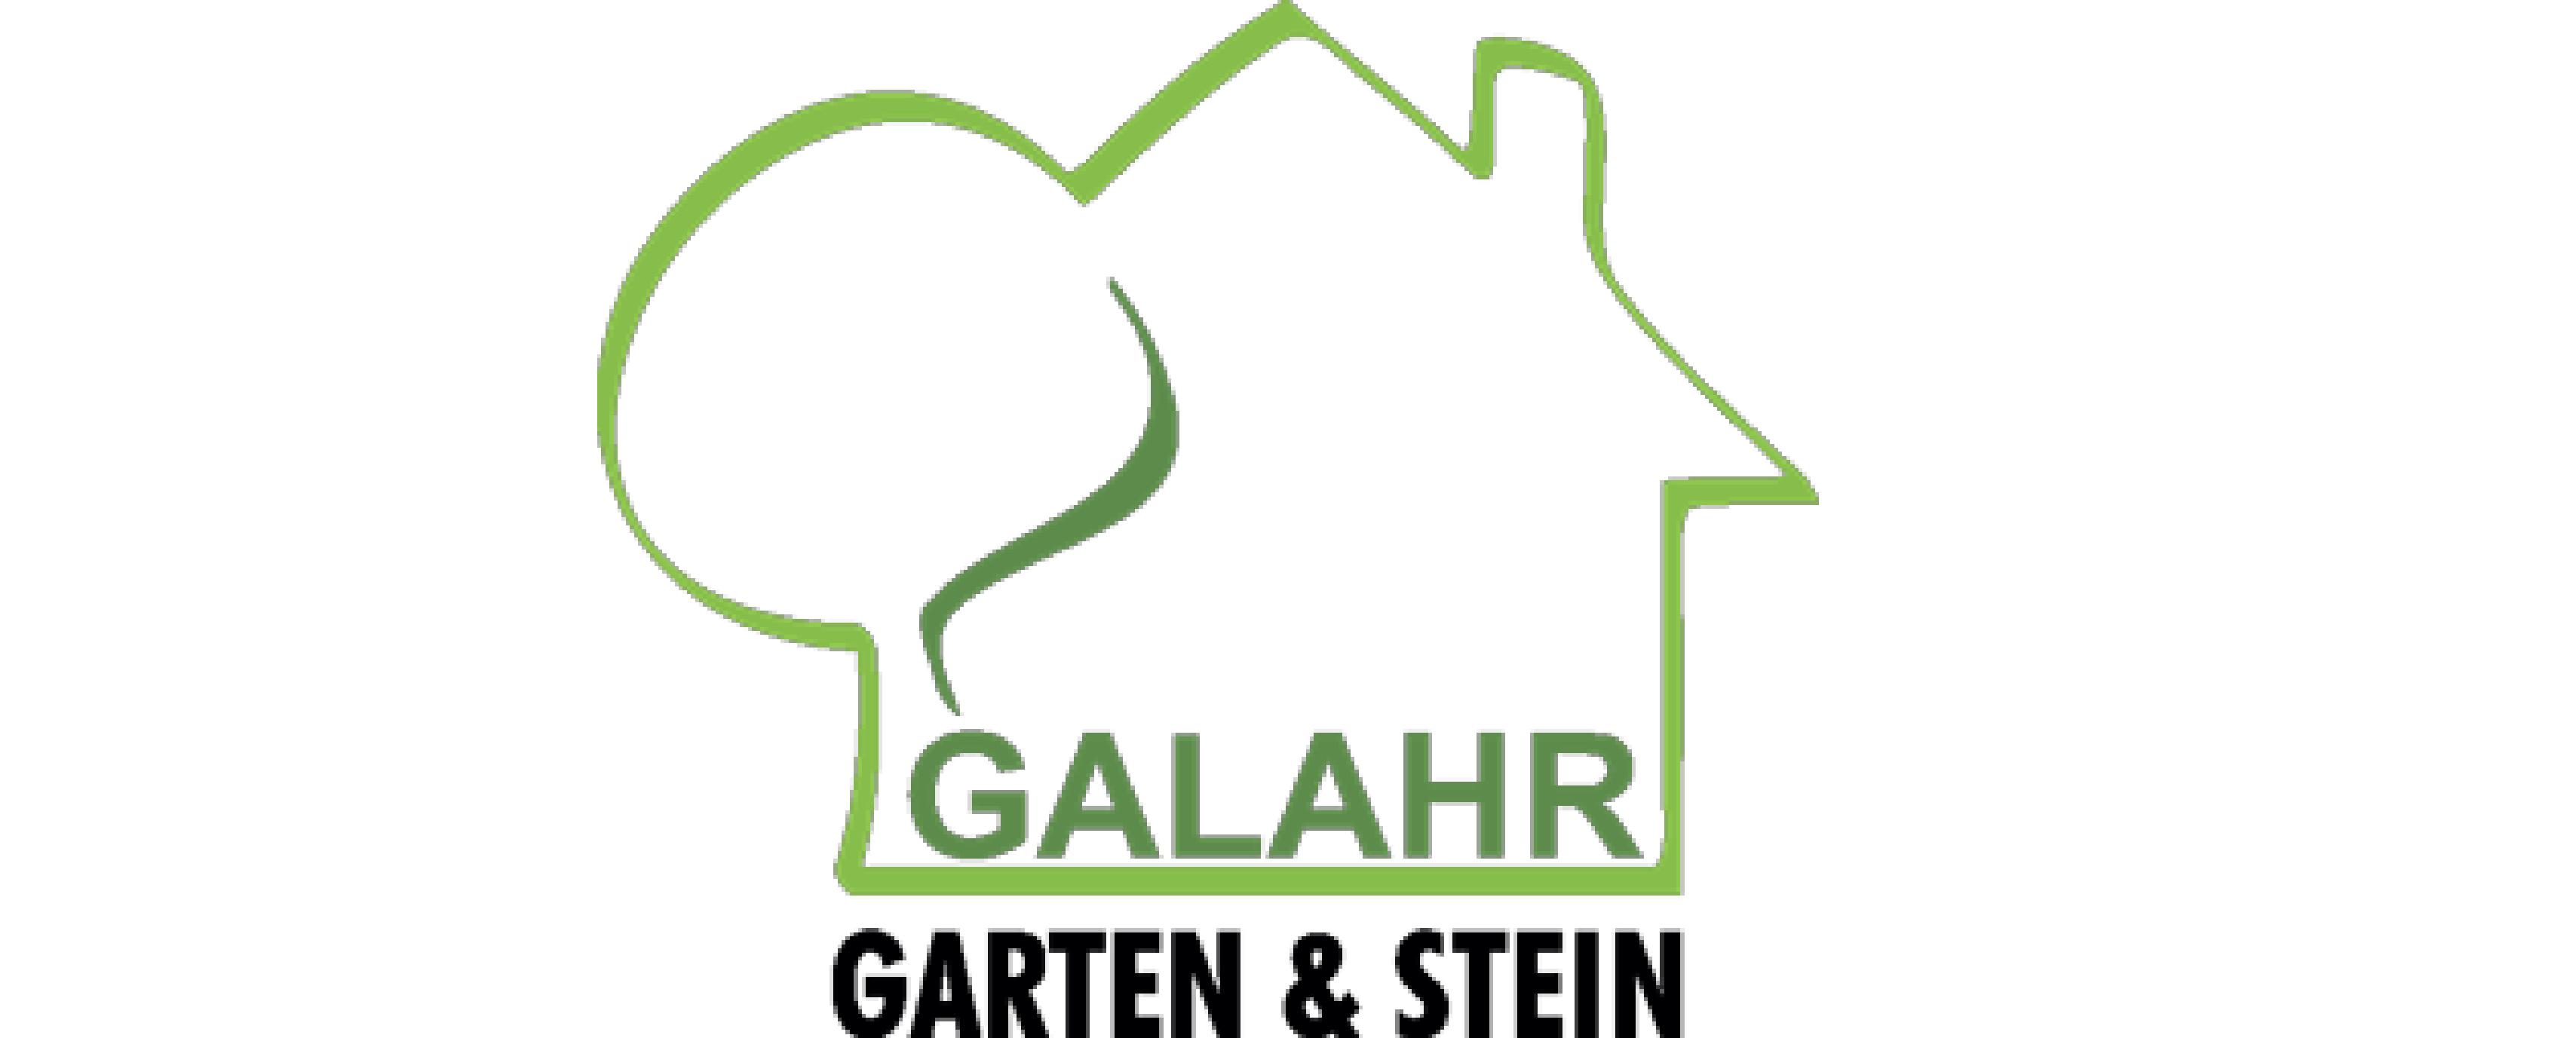 Logo Galahr